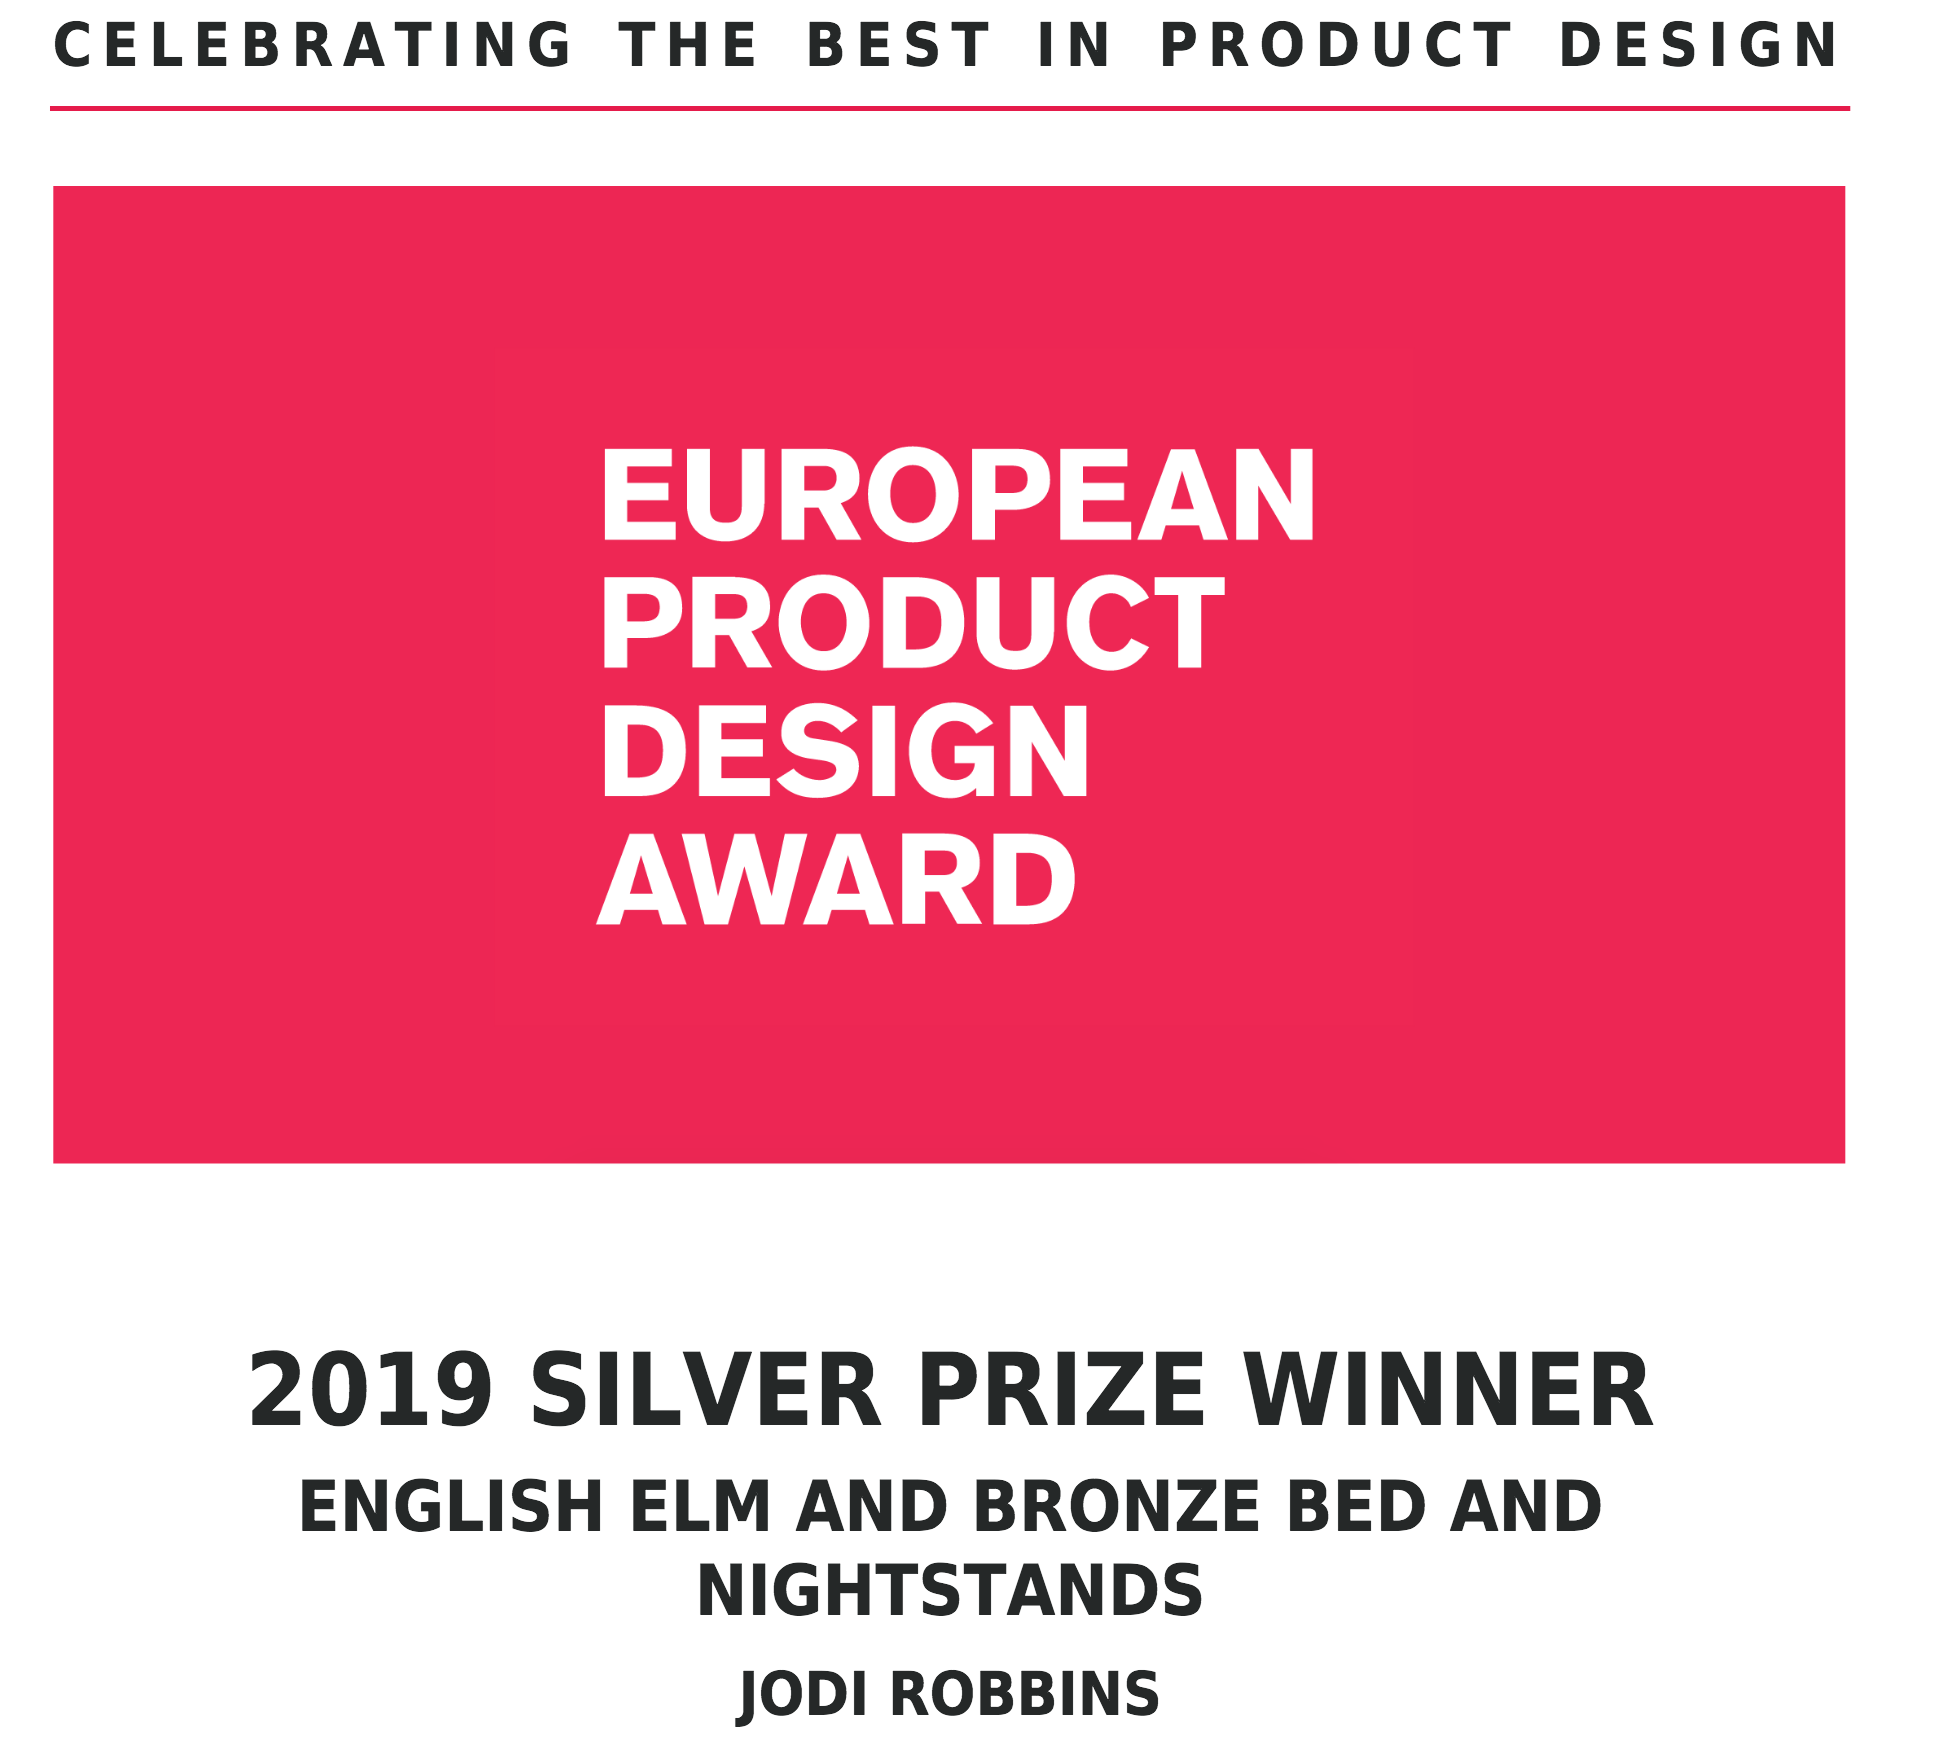 European Product Design Awards 2019